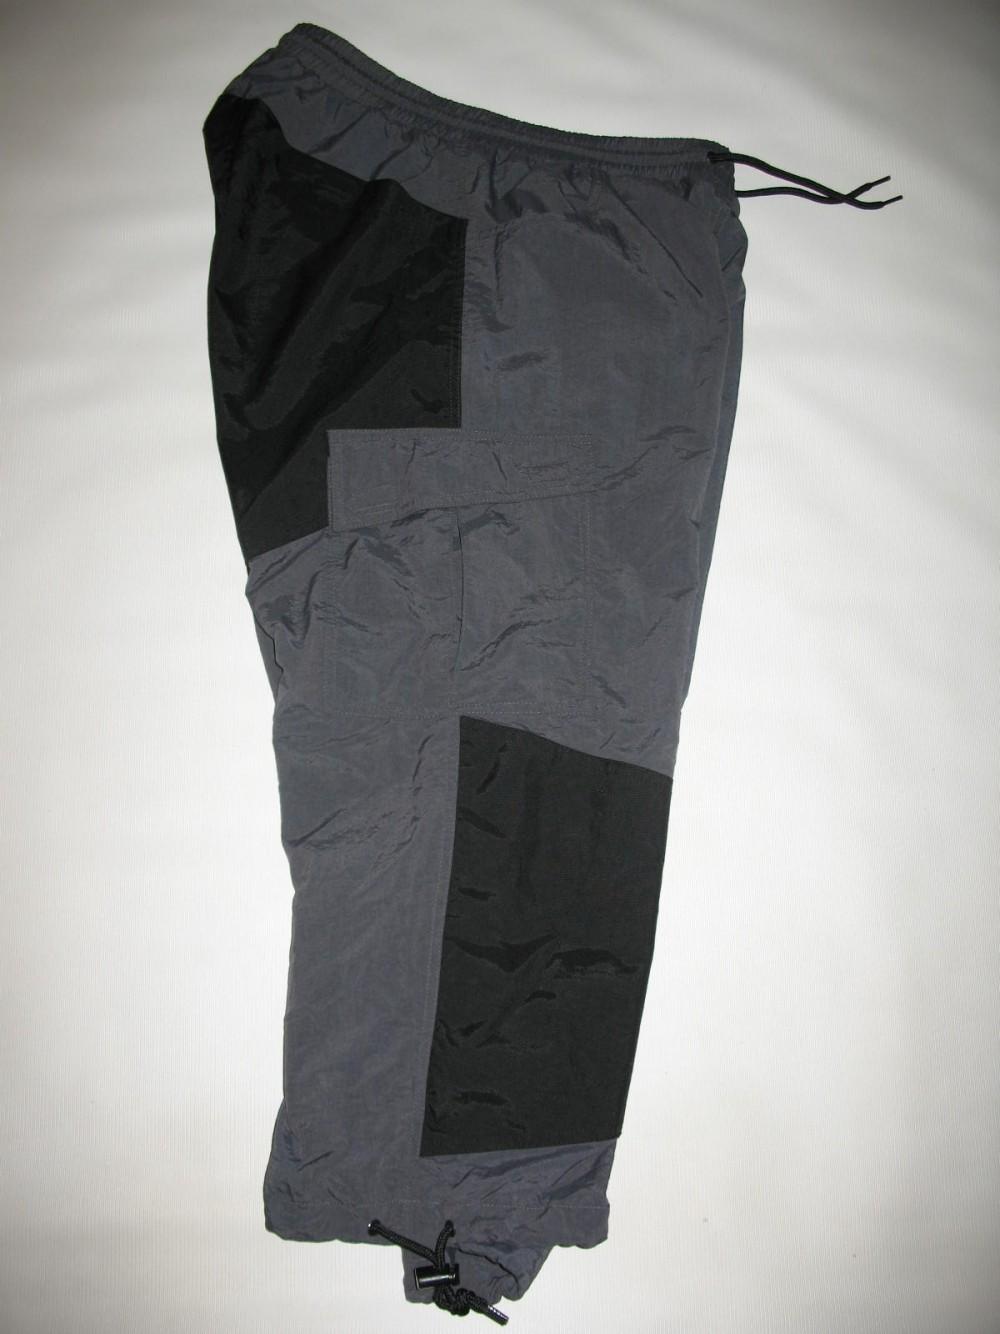 Шорты JACK WOLFSKIN 3/4 pants unisex (размер М) - 2